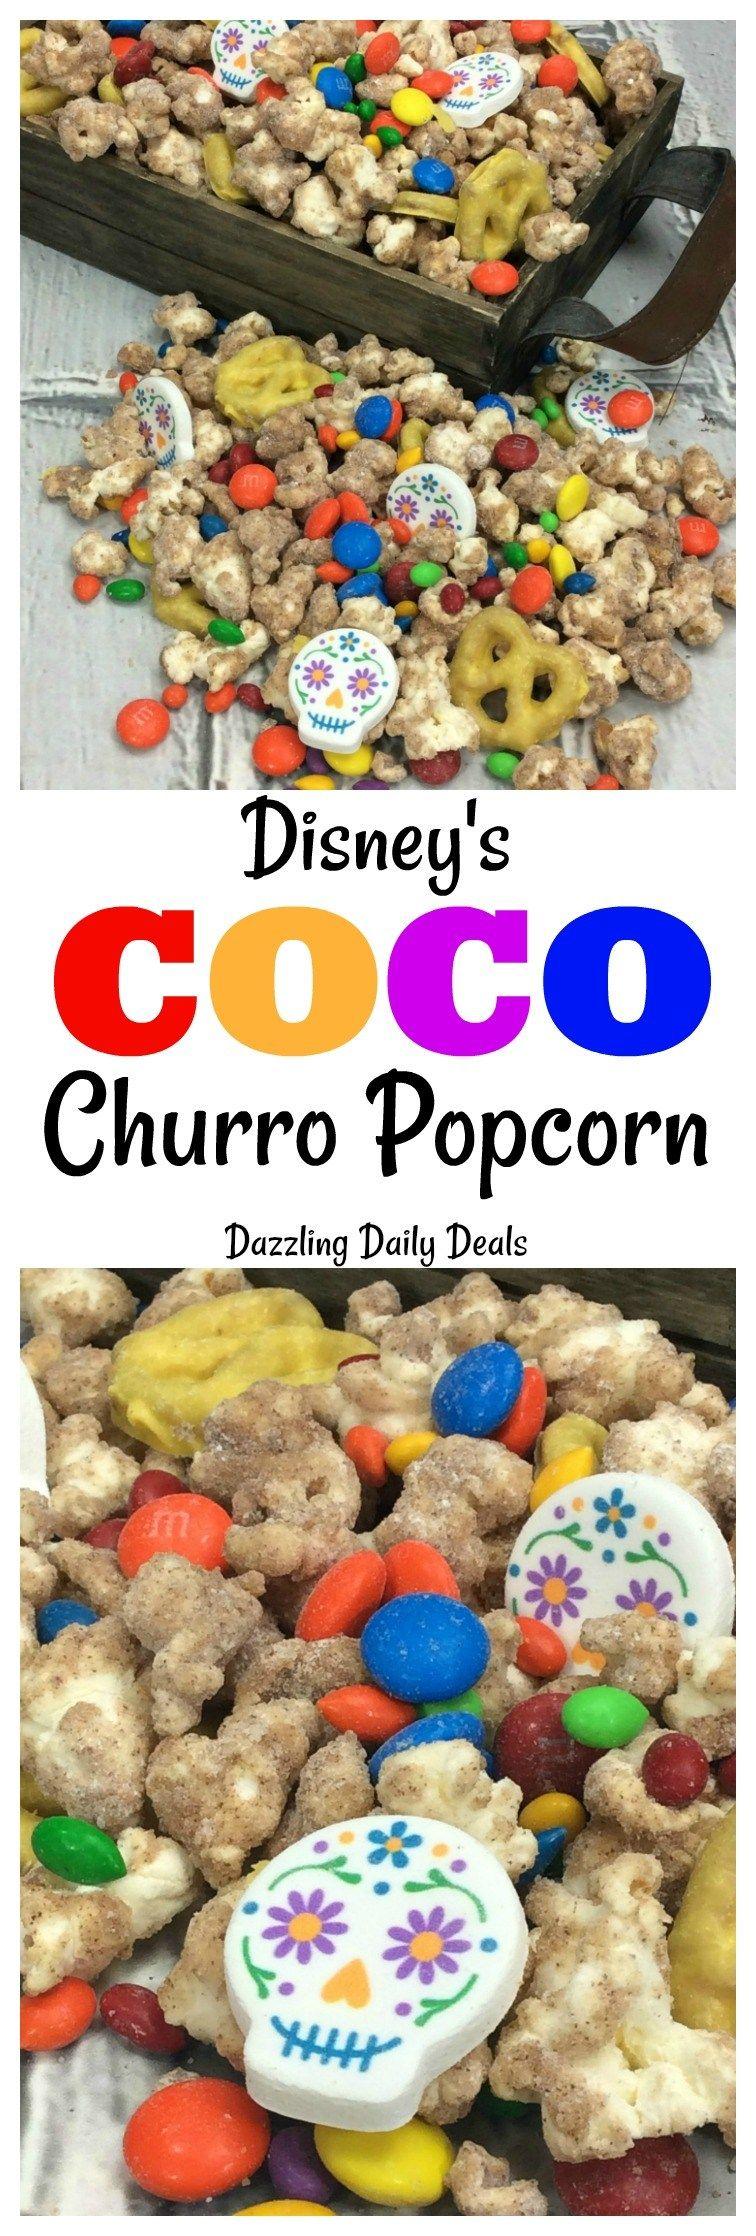 Disney's Coco Churro Popcorn Recipe PixarCocoEvent